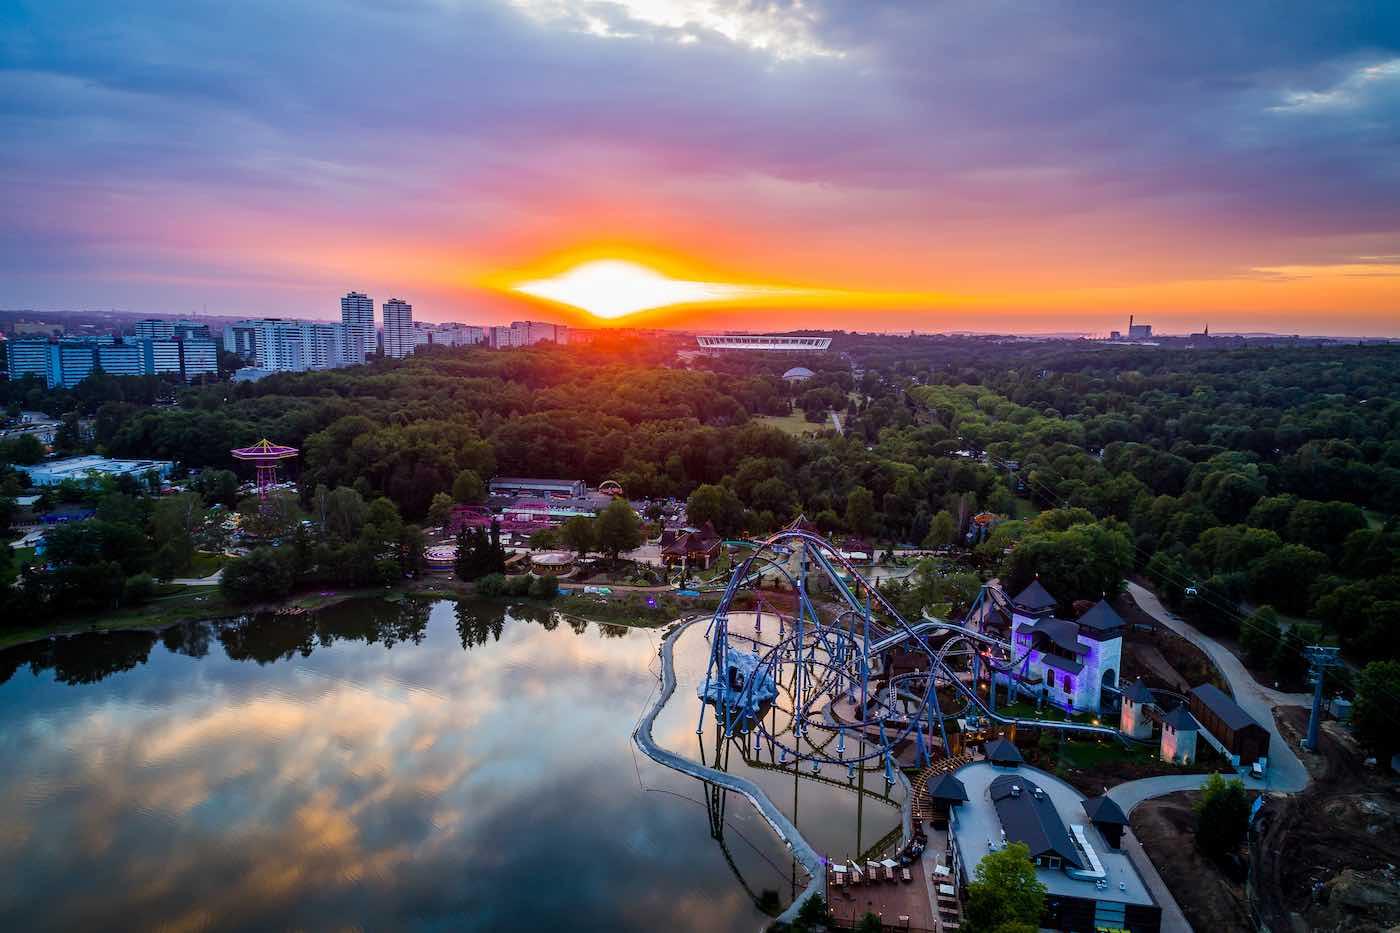 Legendia | Bazyliszek interactive dark ride | theme park Poland